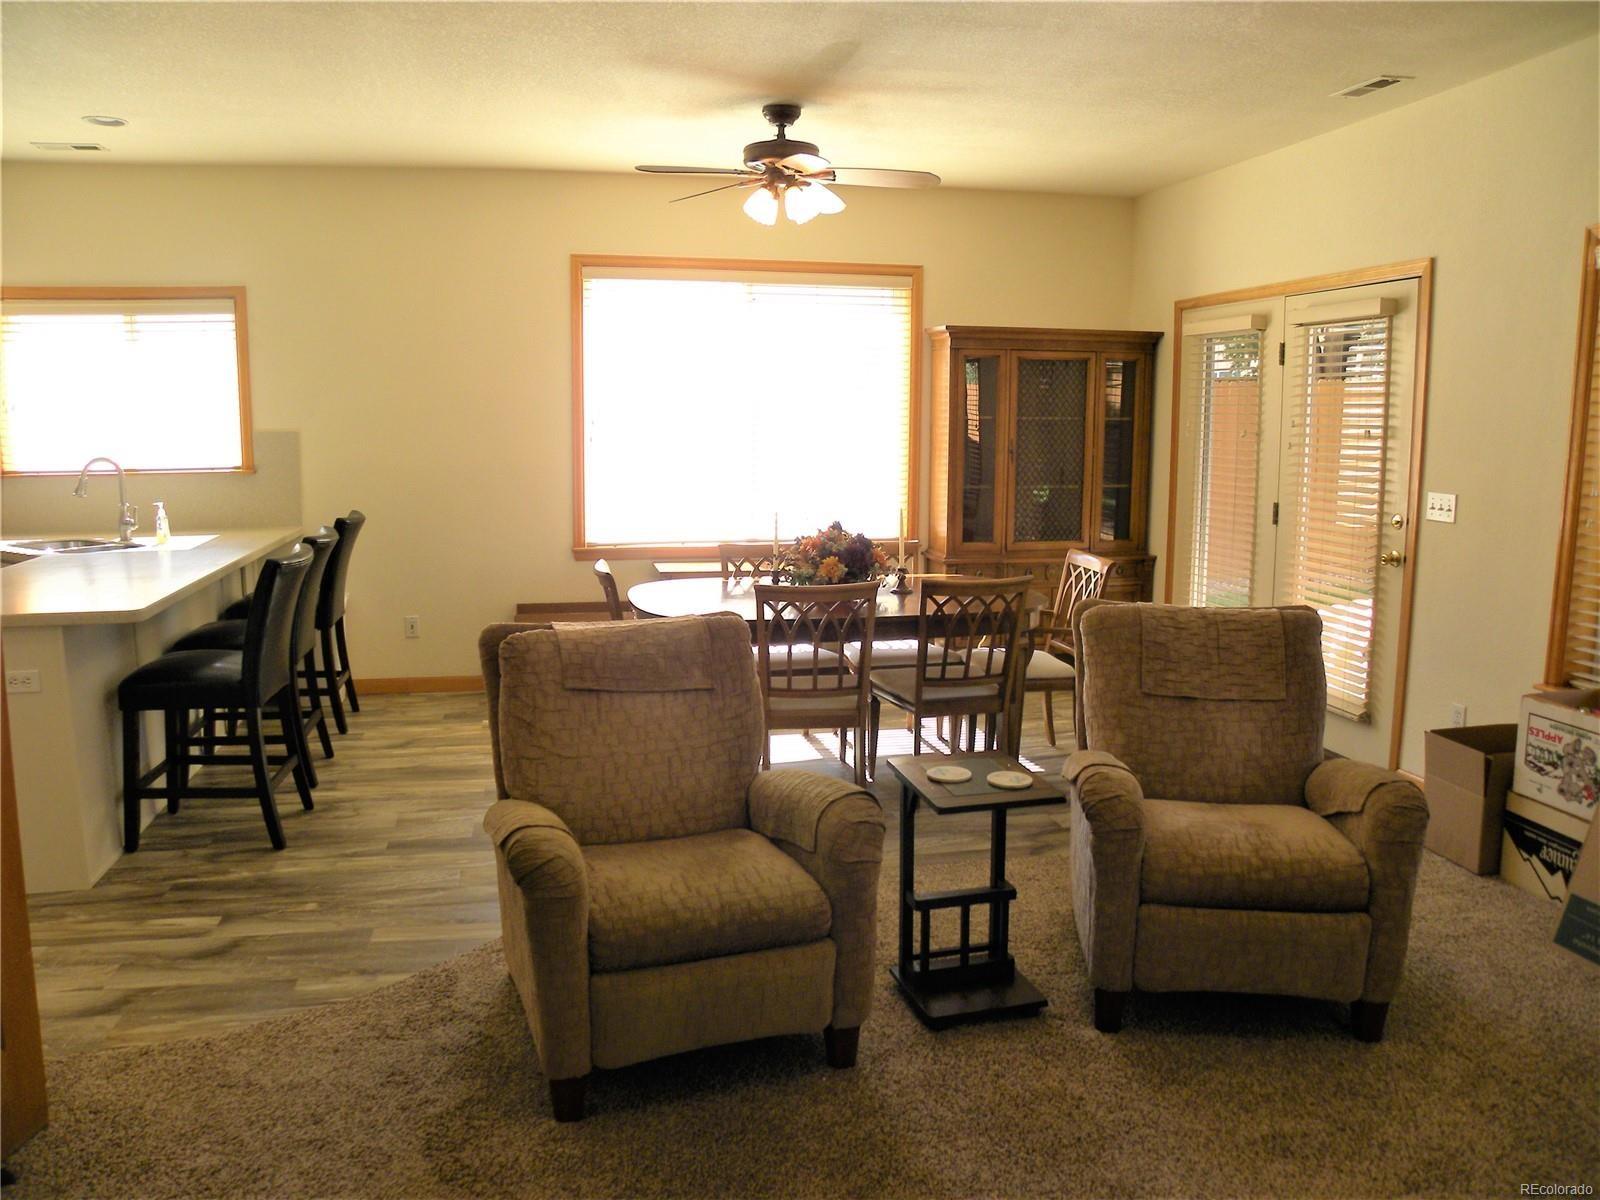 MLS# 5924977 - 9 - 1017 Cedarcrest Drive, Pueblo, CO 81005